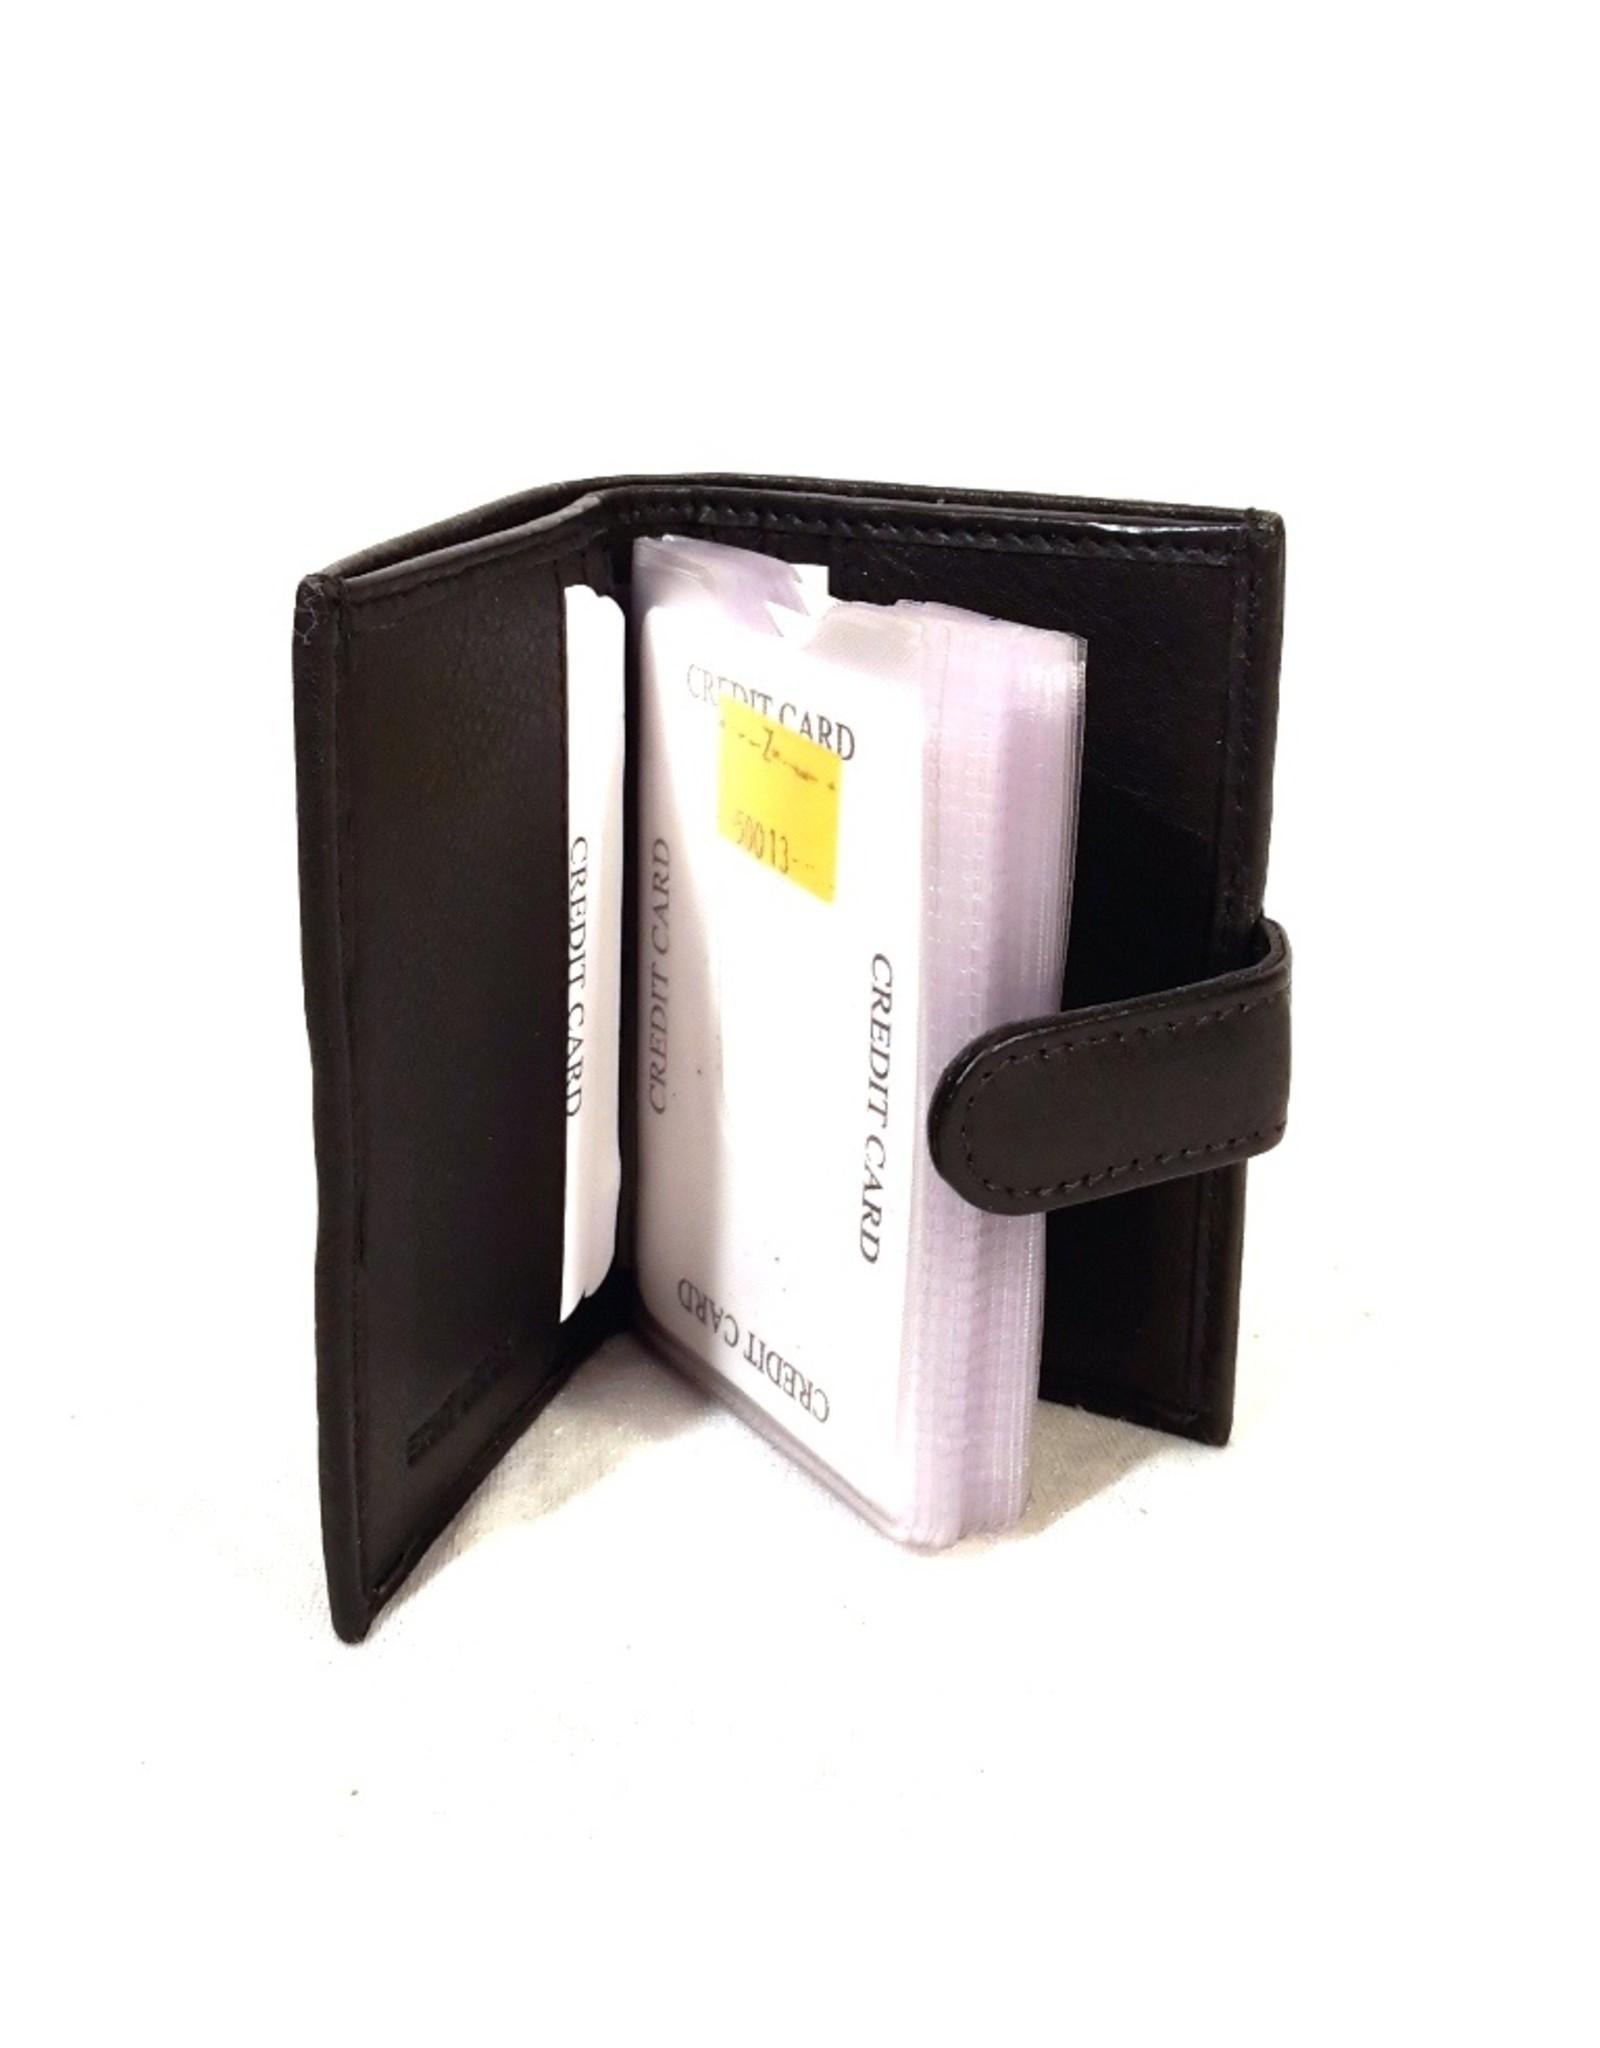 Stern Leren Portemonnees - Leren Mini-Portemonnee en Pasjeshouder in één  zwart